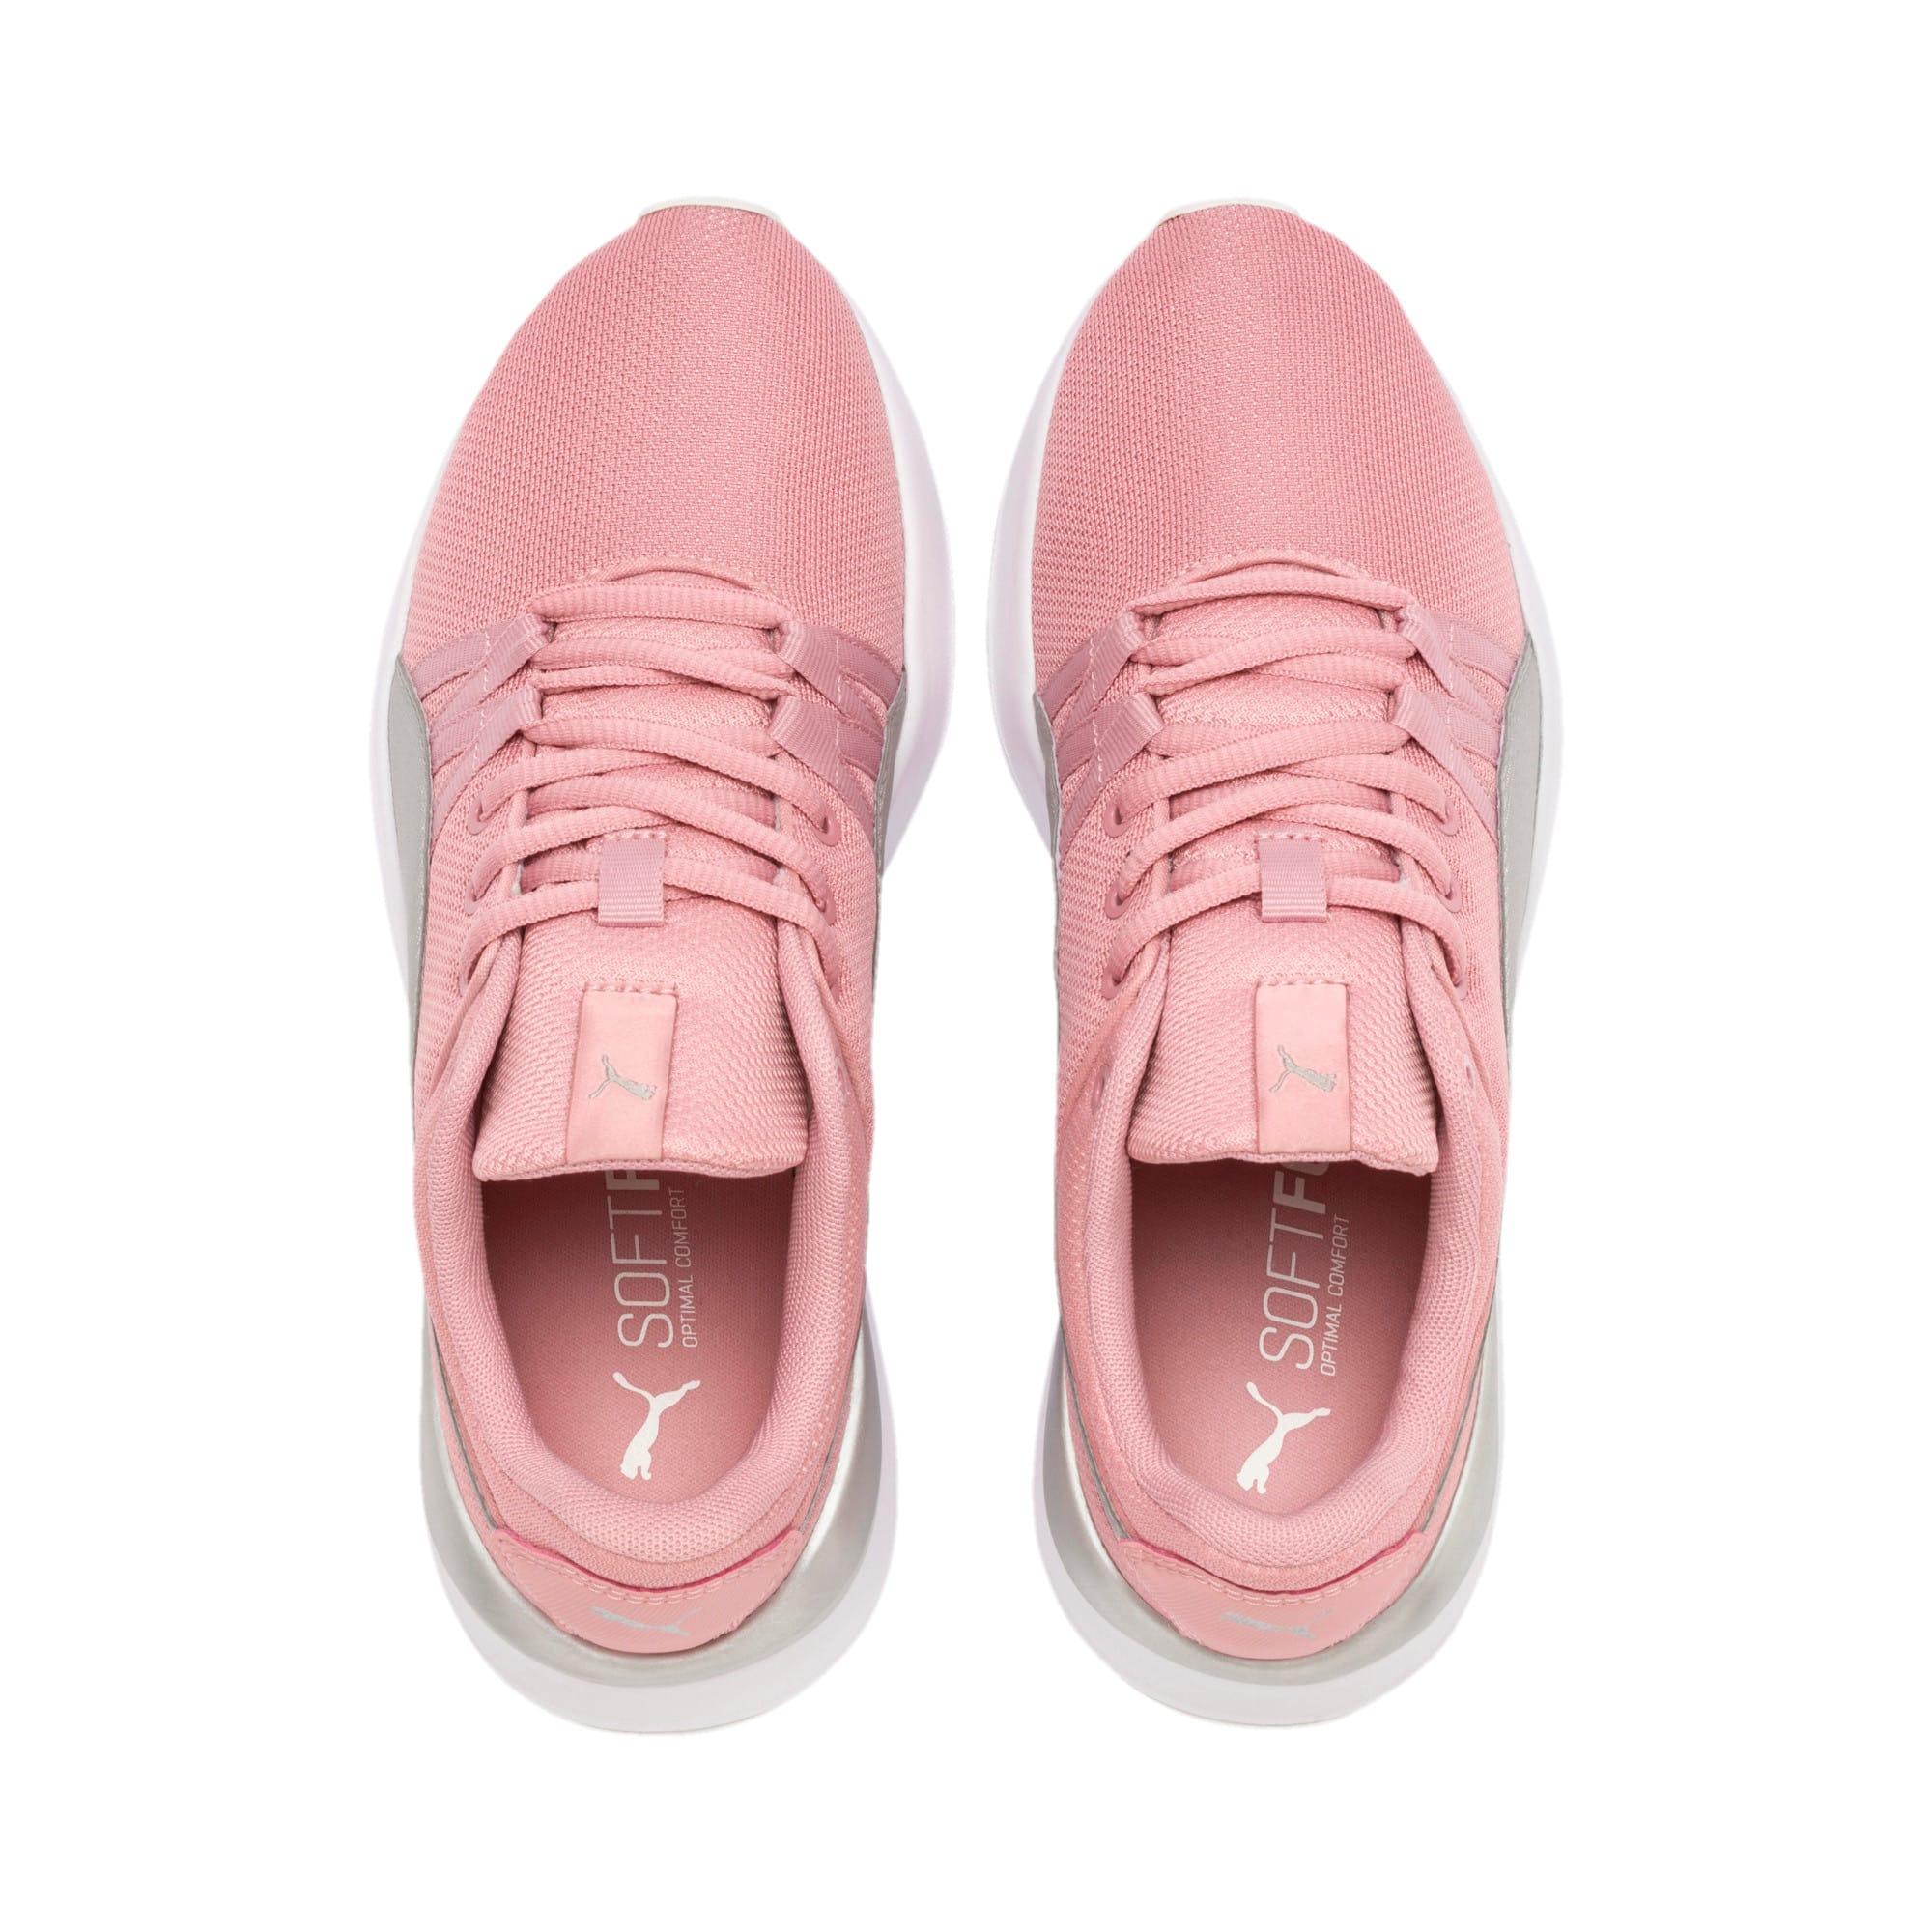 Thumbnail 6 of Adela Breathe Sneakers JR, Bridal Rose-Puma Silver, medium